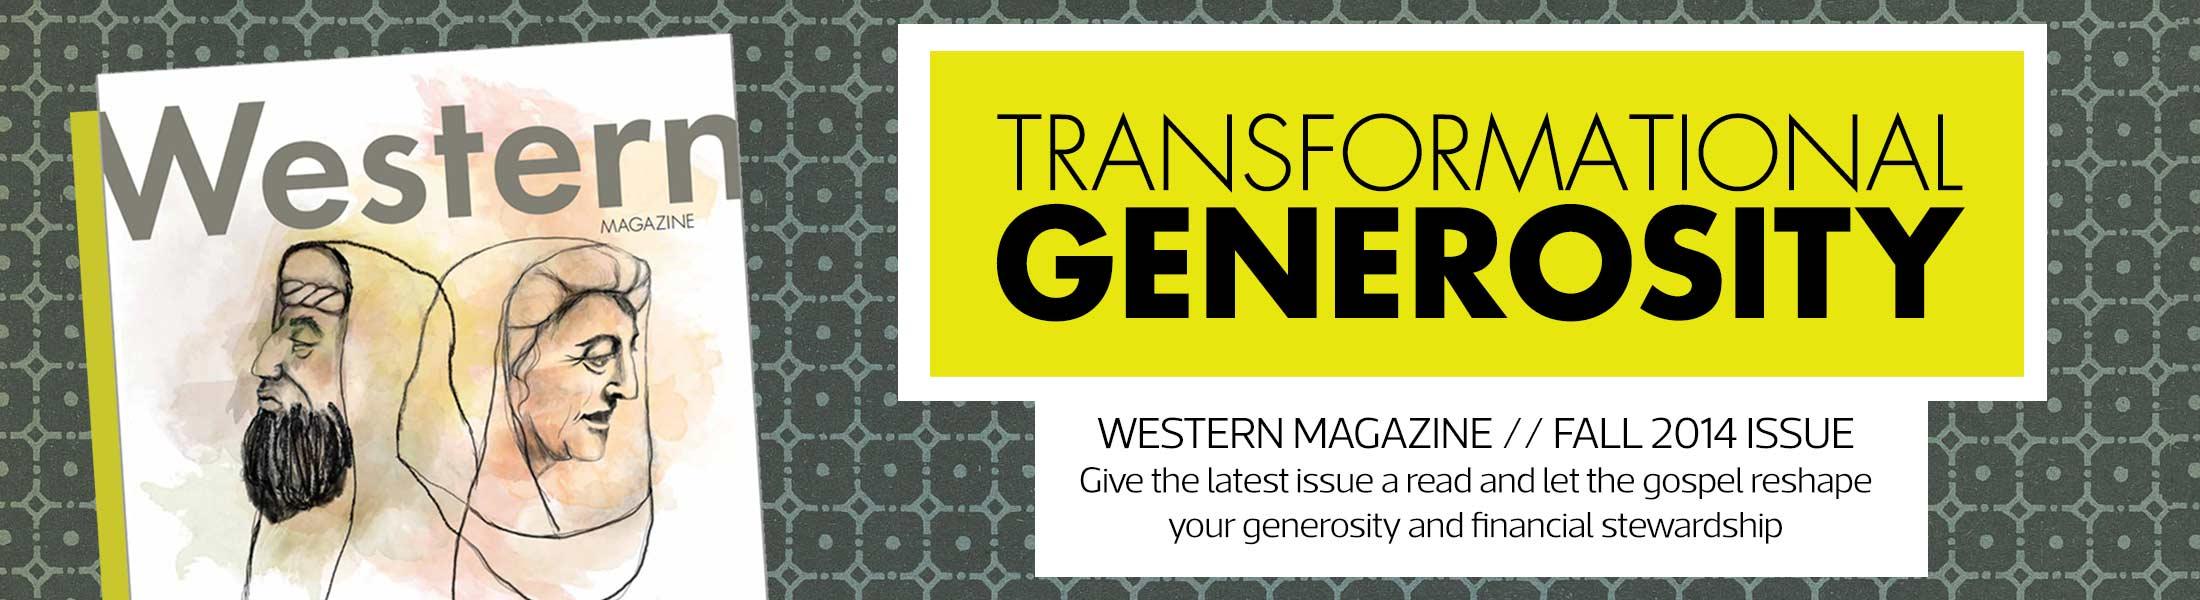 Western Magazine Fall 2014 Issue